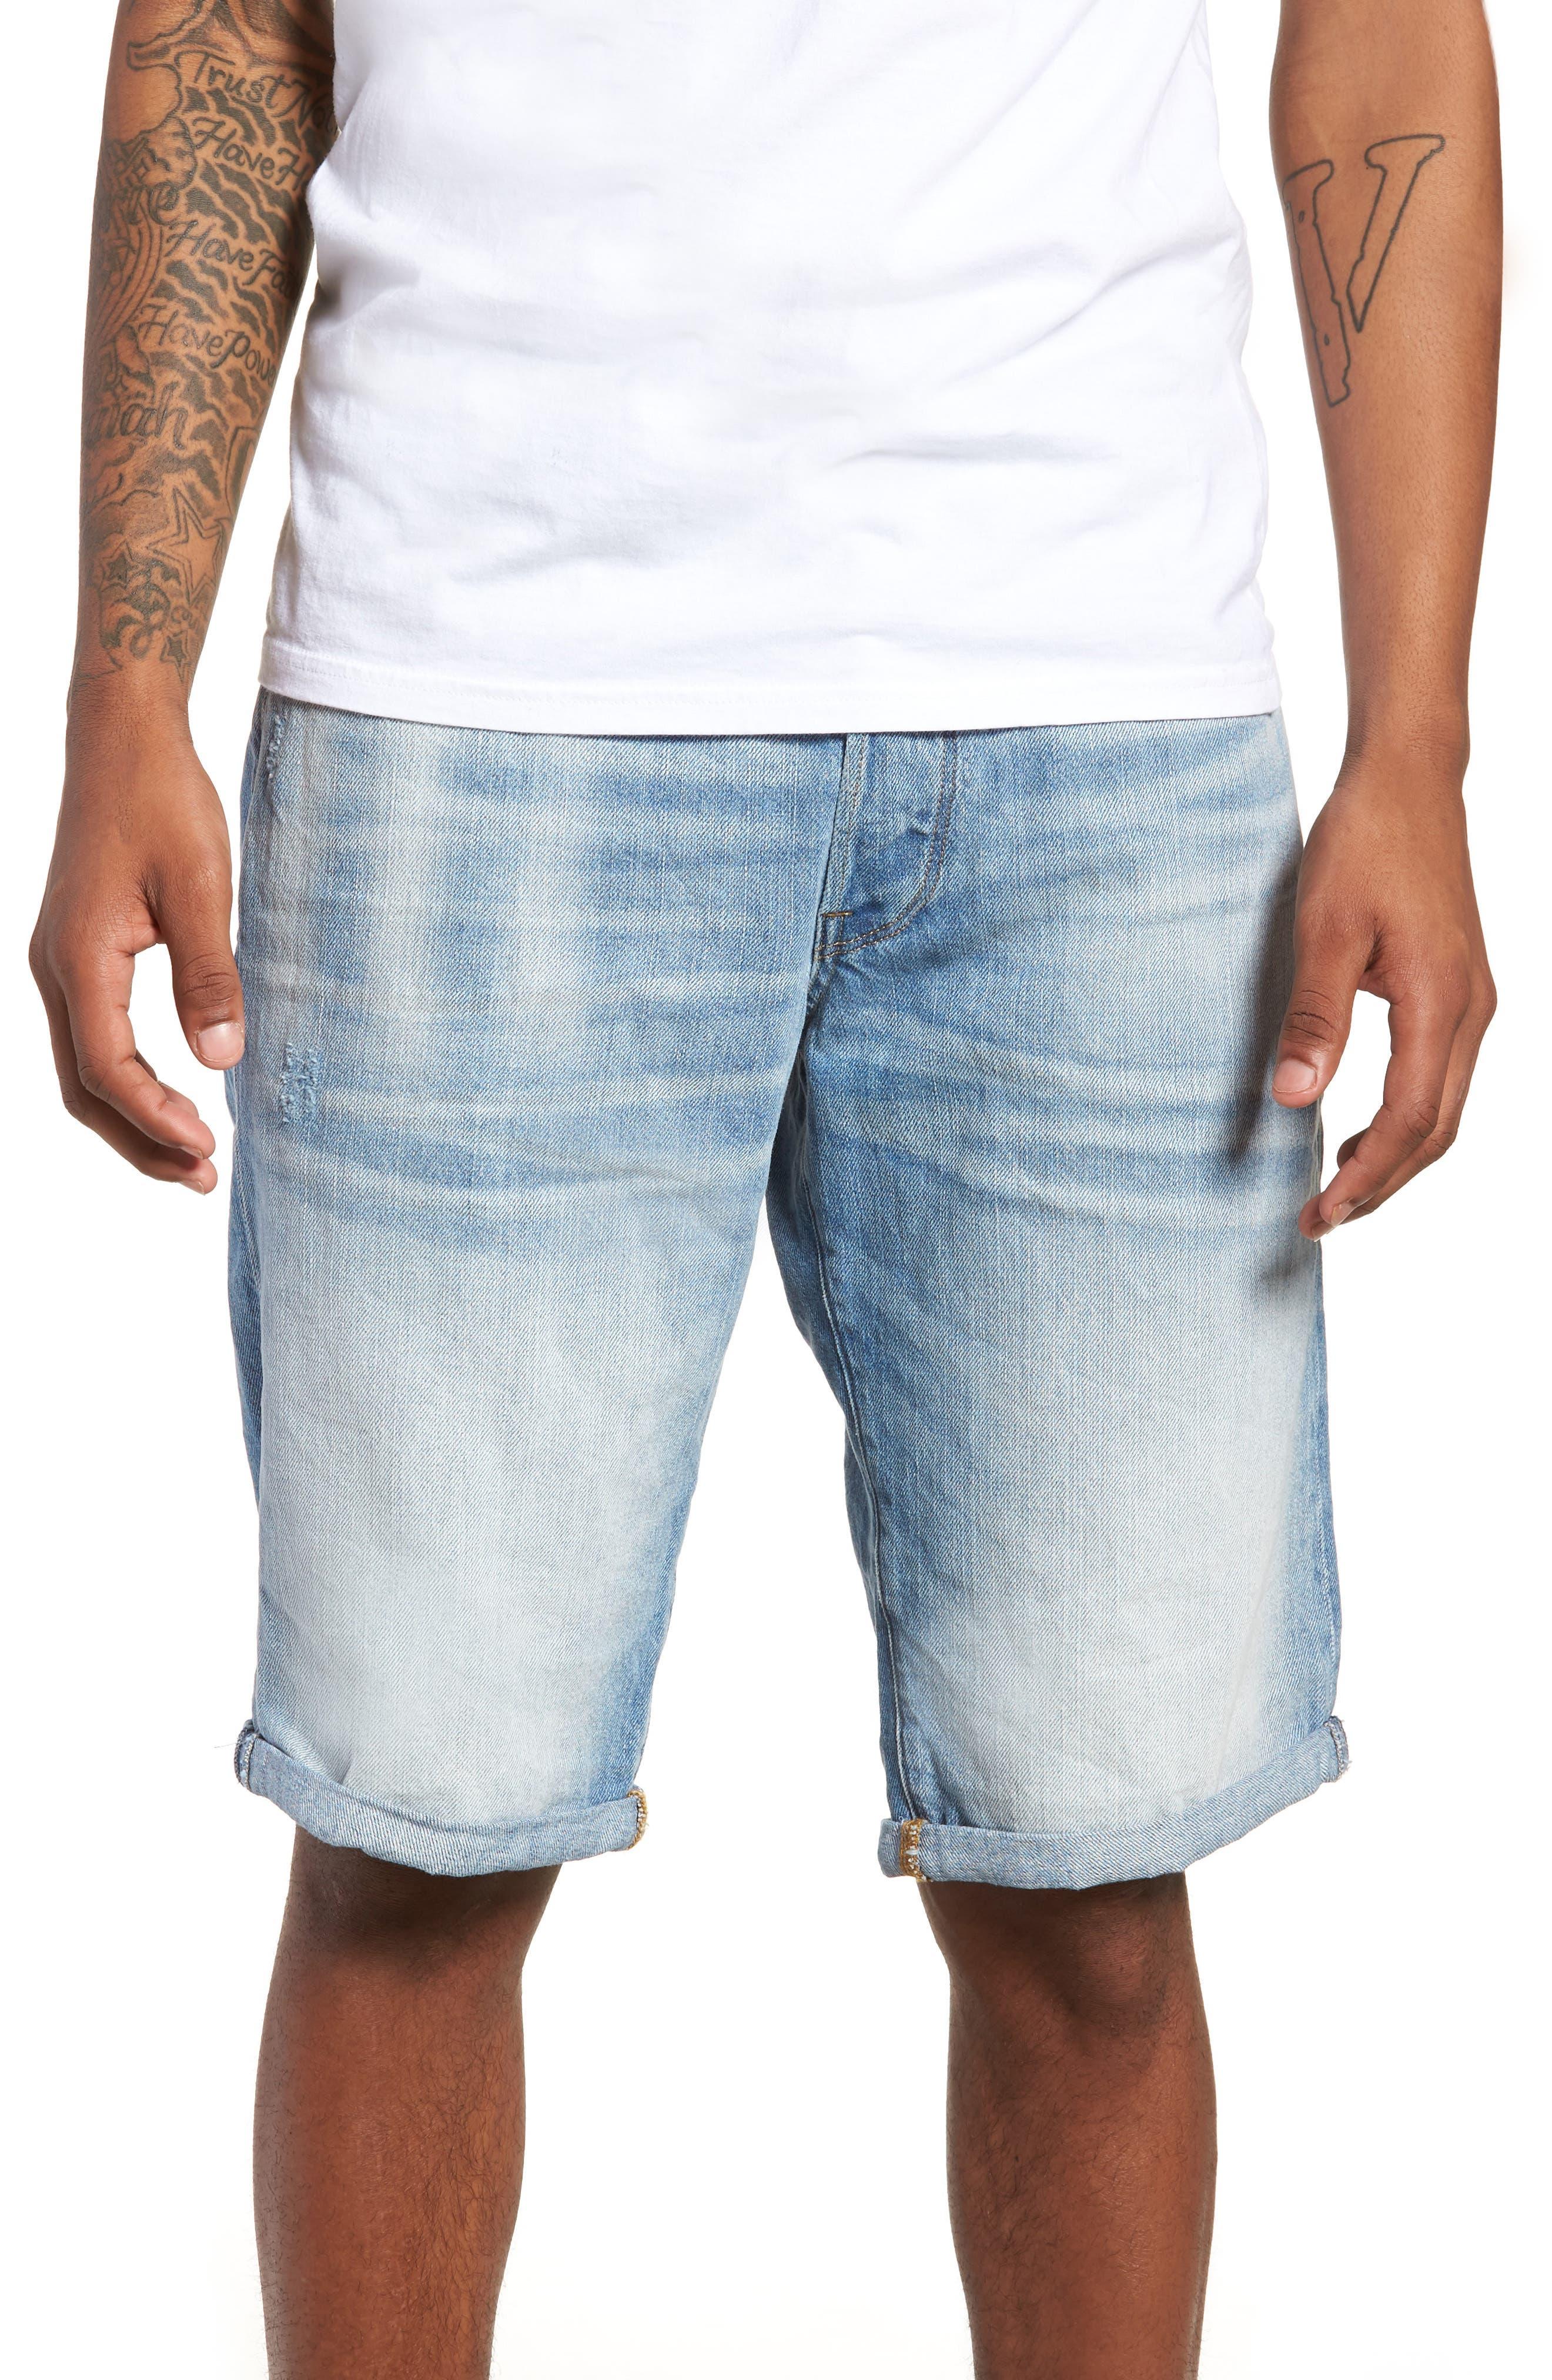 Slim Fit Denim Shorts,                             Main thumbnail 1, color,                             Light Aged